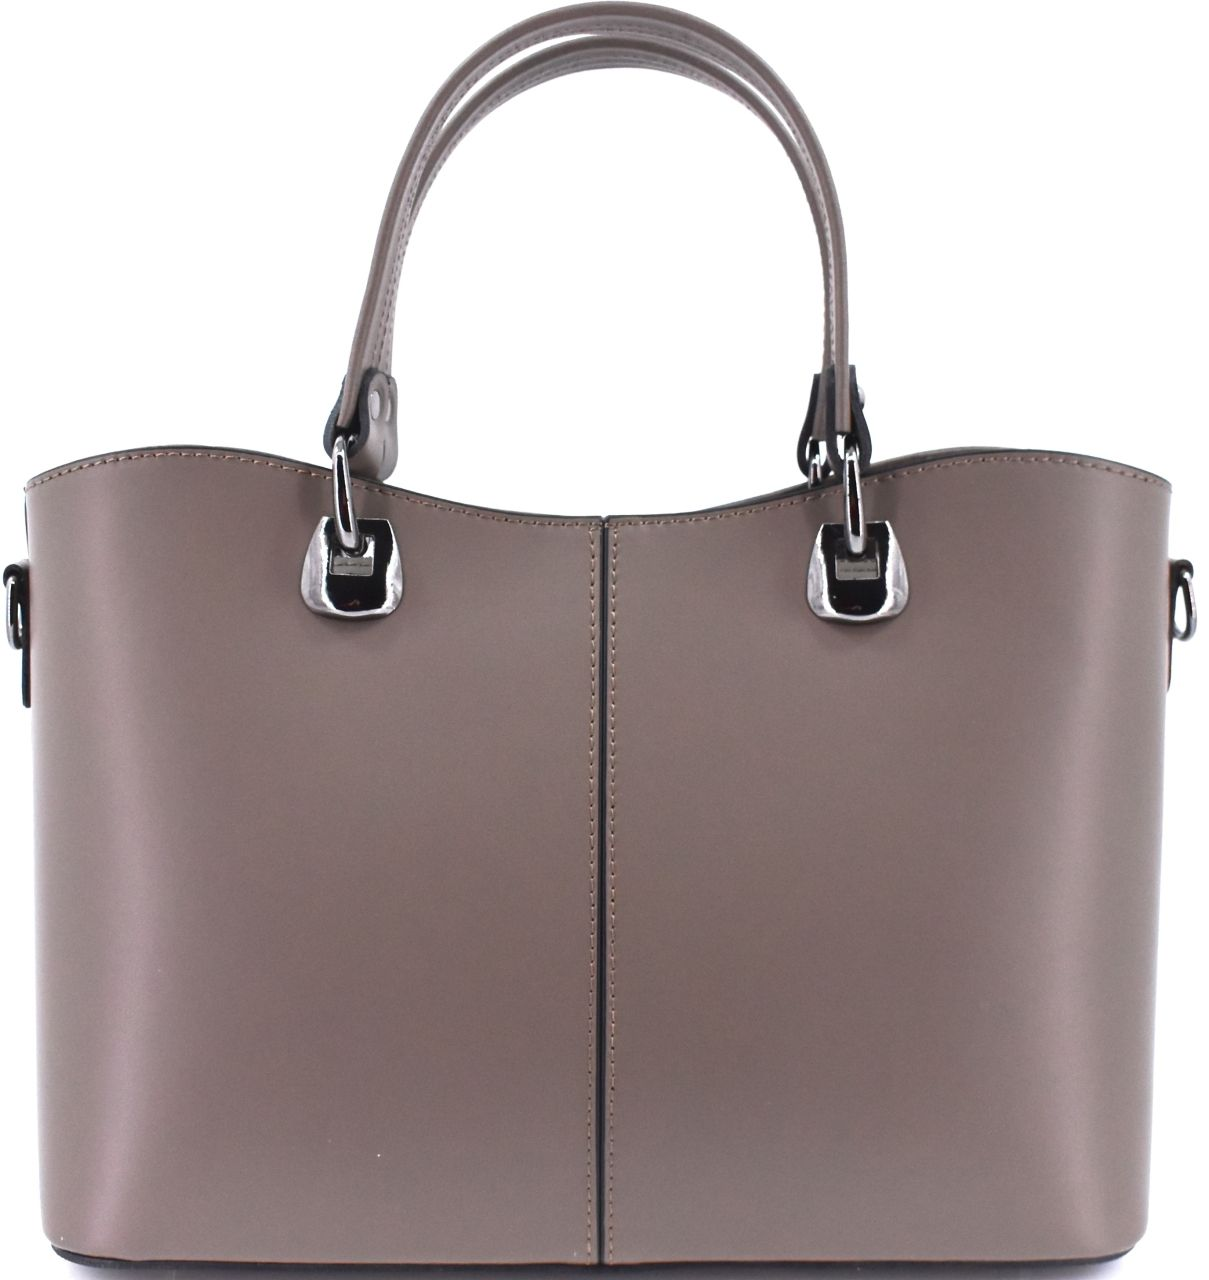 Dámská kožená kabelka Arteddy - taupe 36903